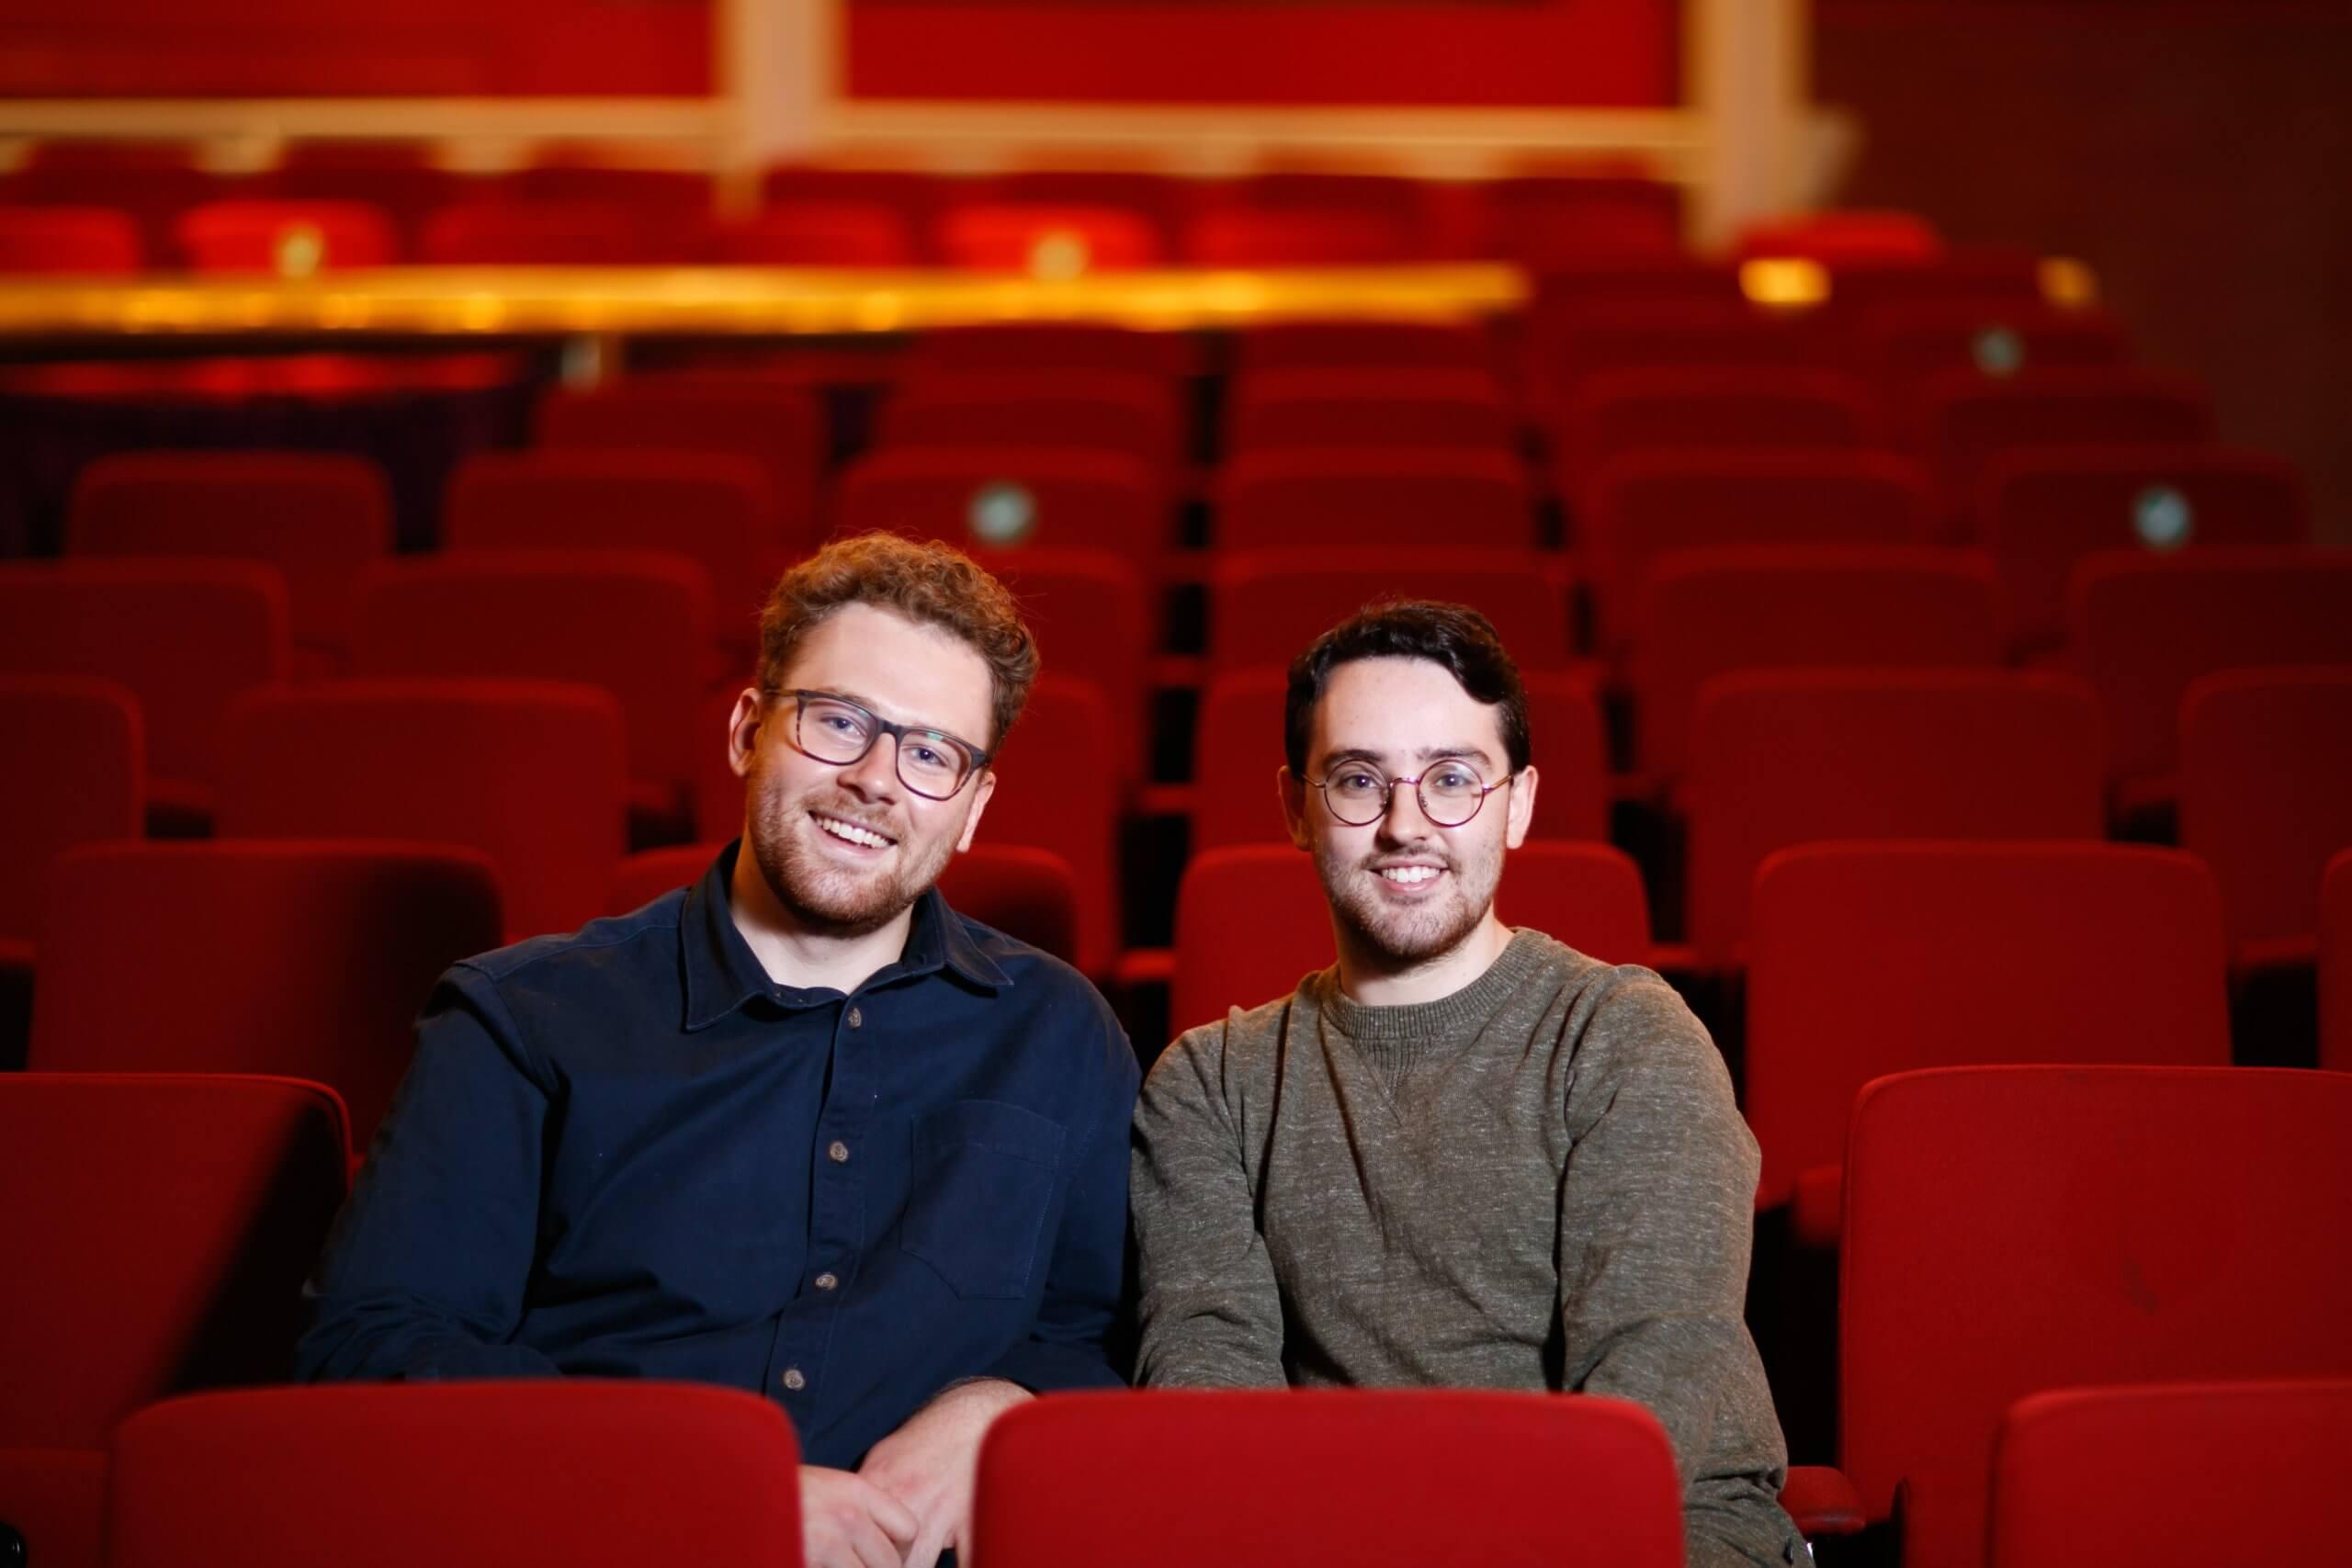 Powerhouse musical theatre partnership in the spotlight Image